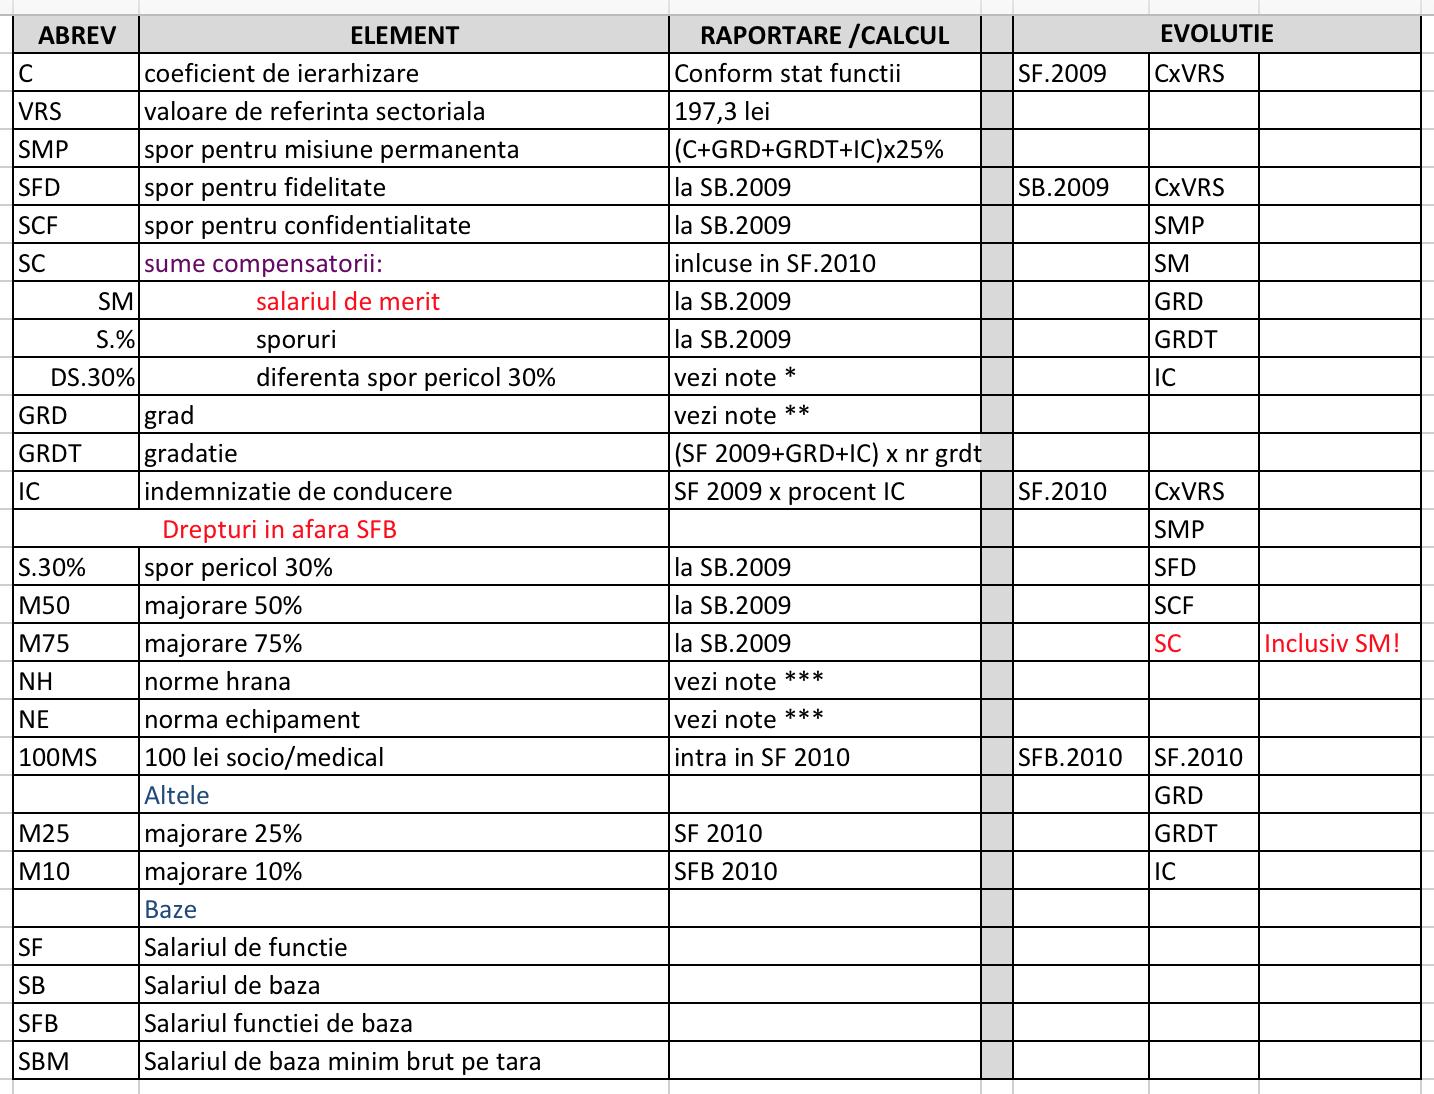 Struct sal tabel